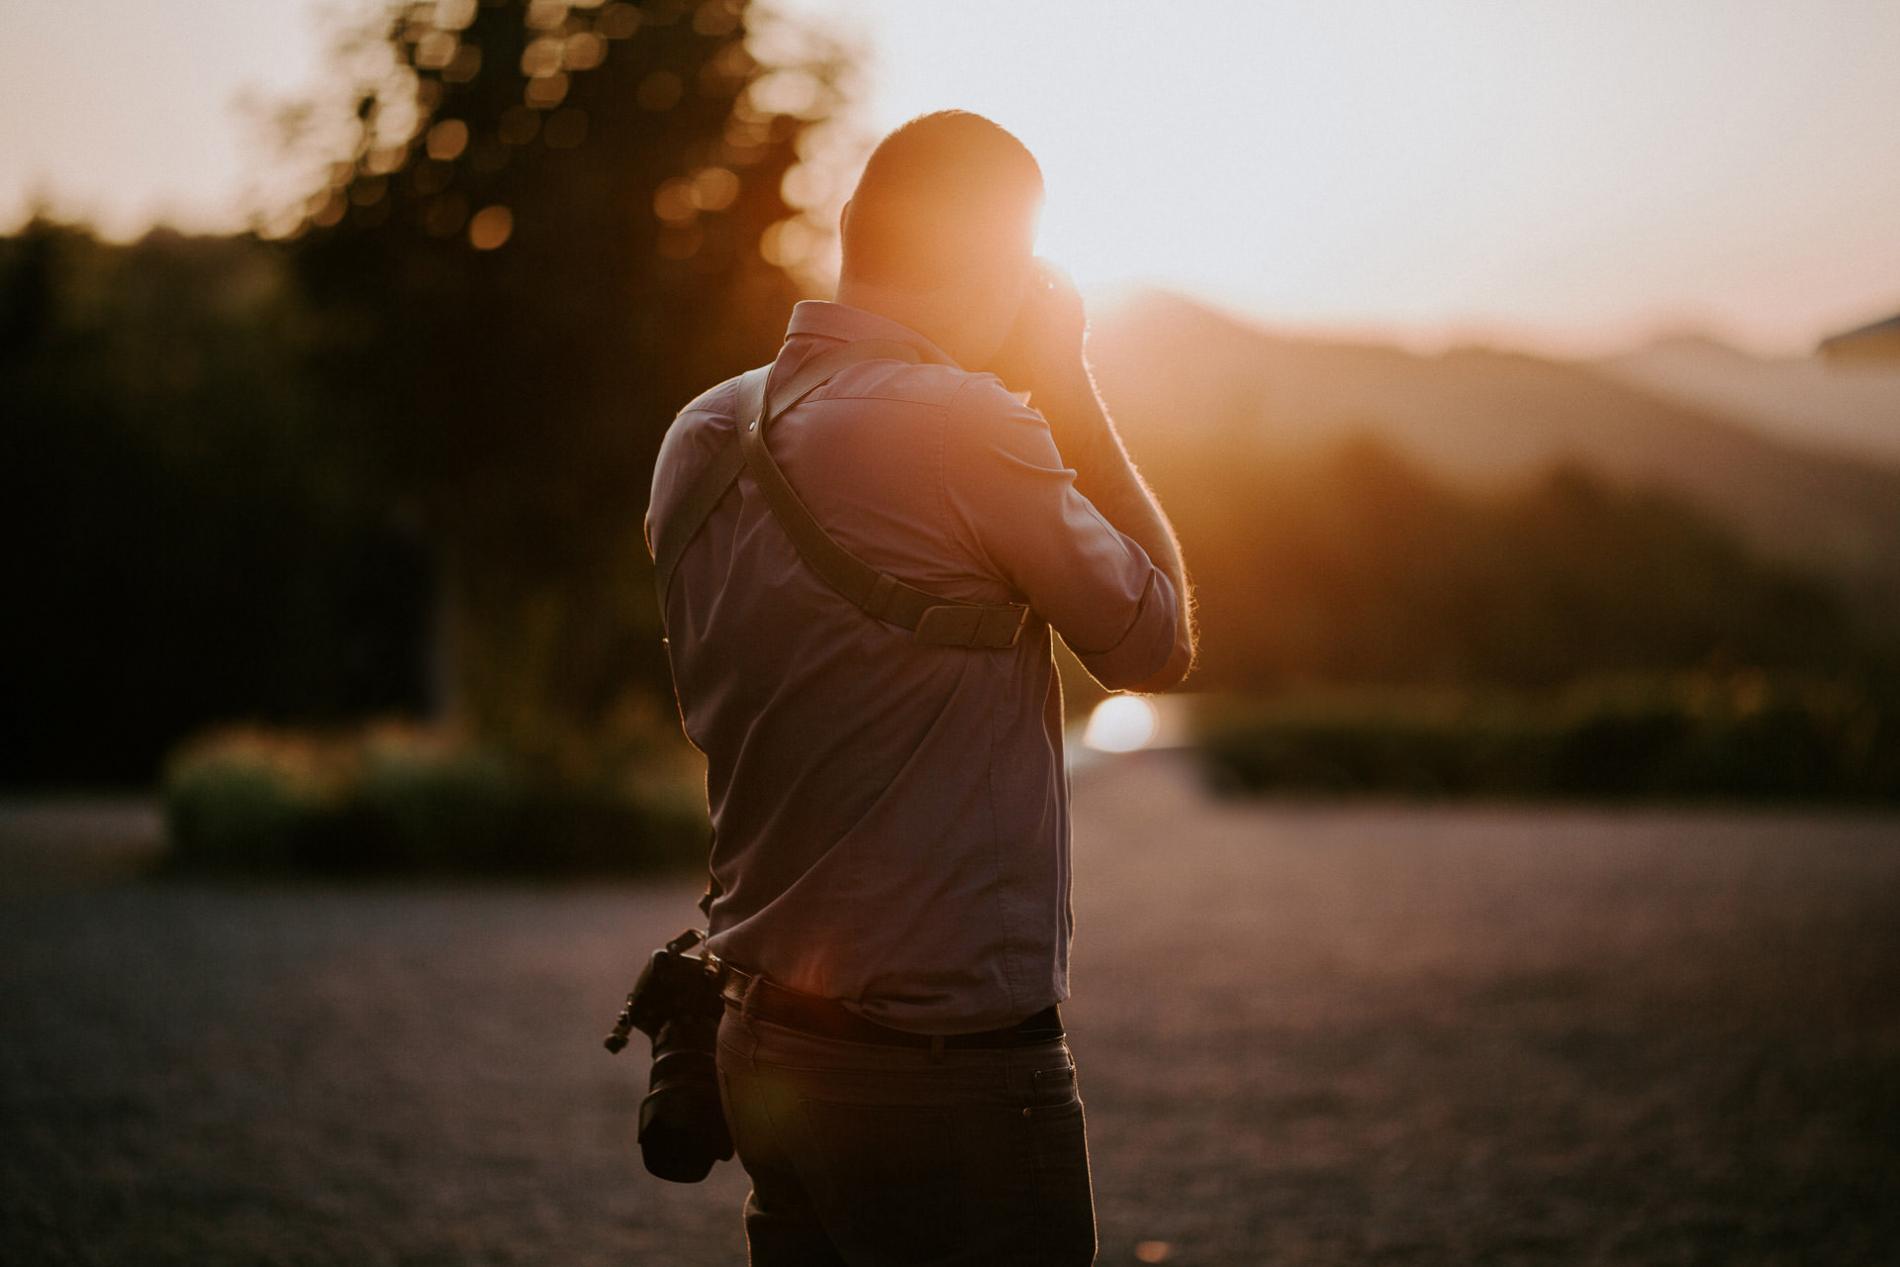 Verbania Verbano-Cusio-Ossola huwelijksfotograaf met camera bij zonsondergang.